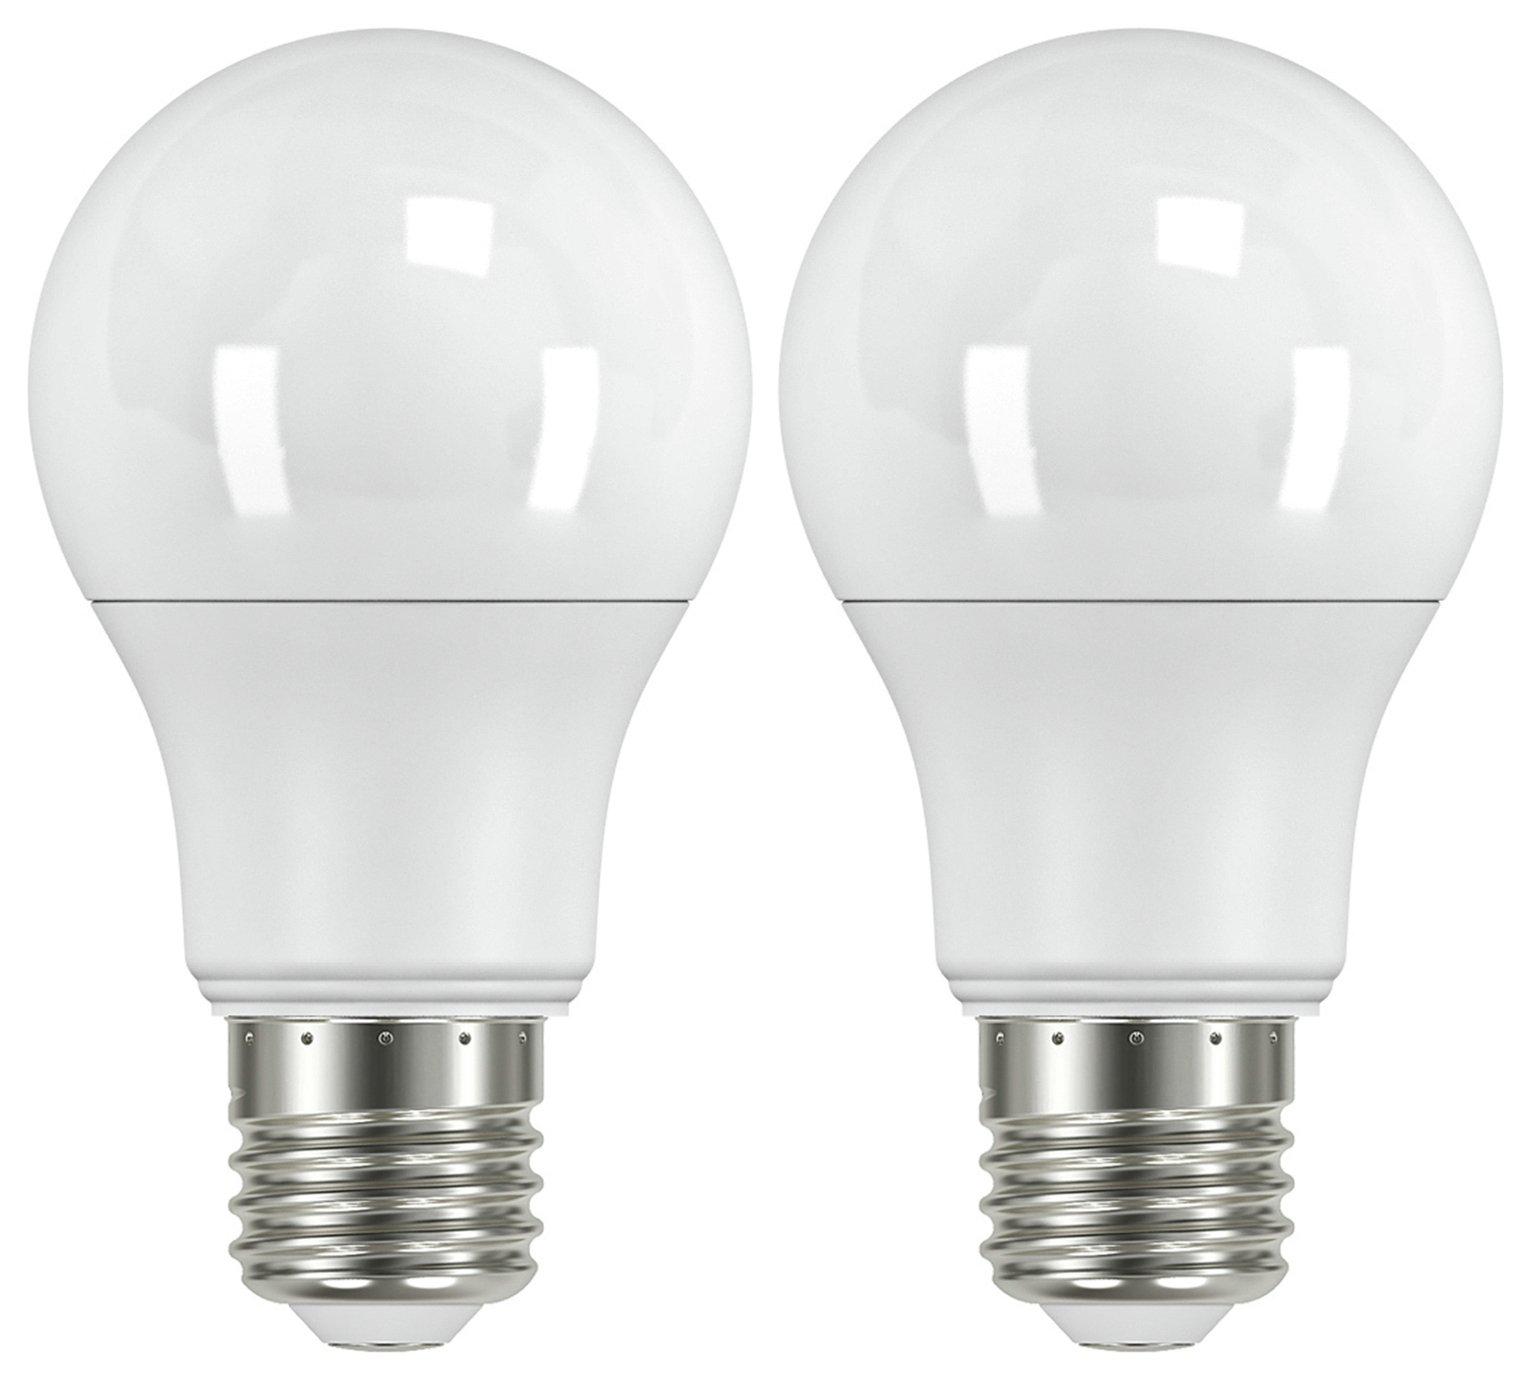 Argos Home 8W LED ES Light Bulb - 2 Pack